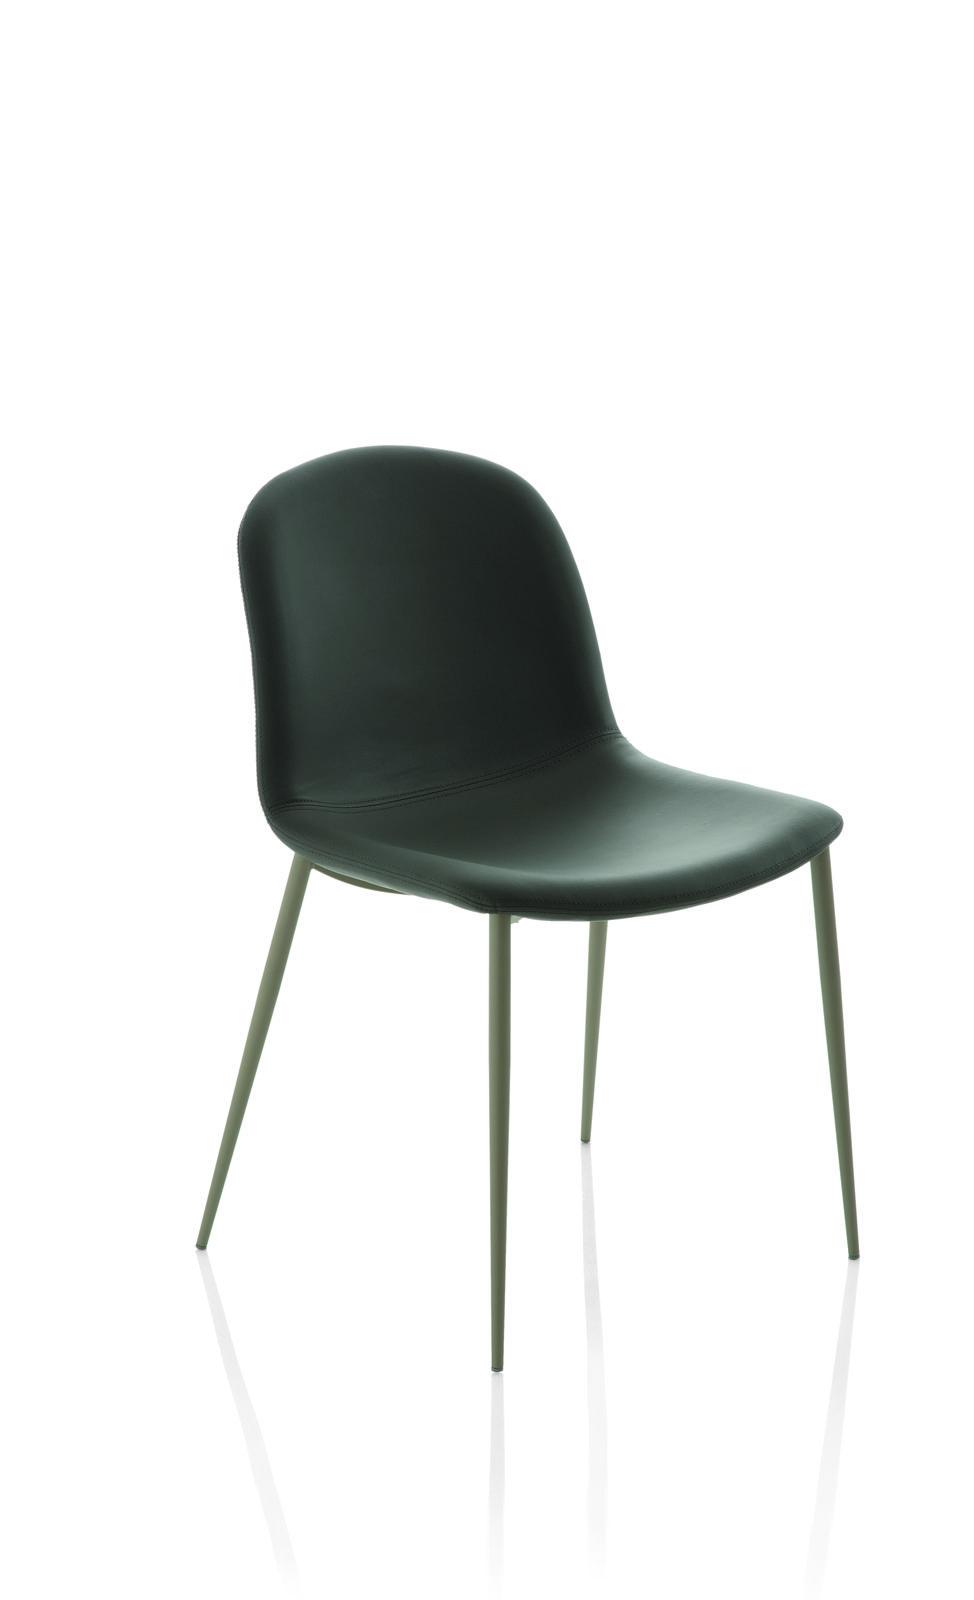 Bontempi Casa Seventy chair metal legs Contemporary dining chair – Metal Frame Dining Chairs